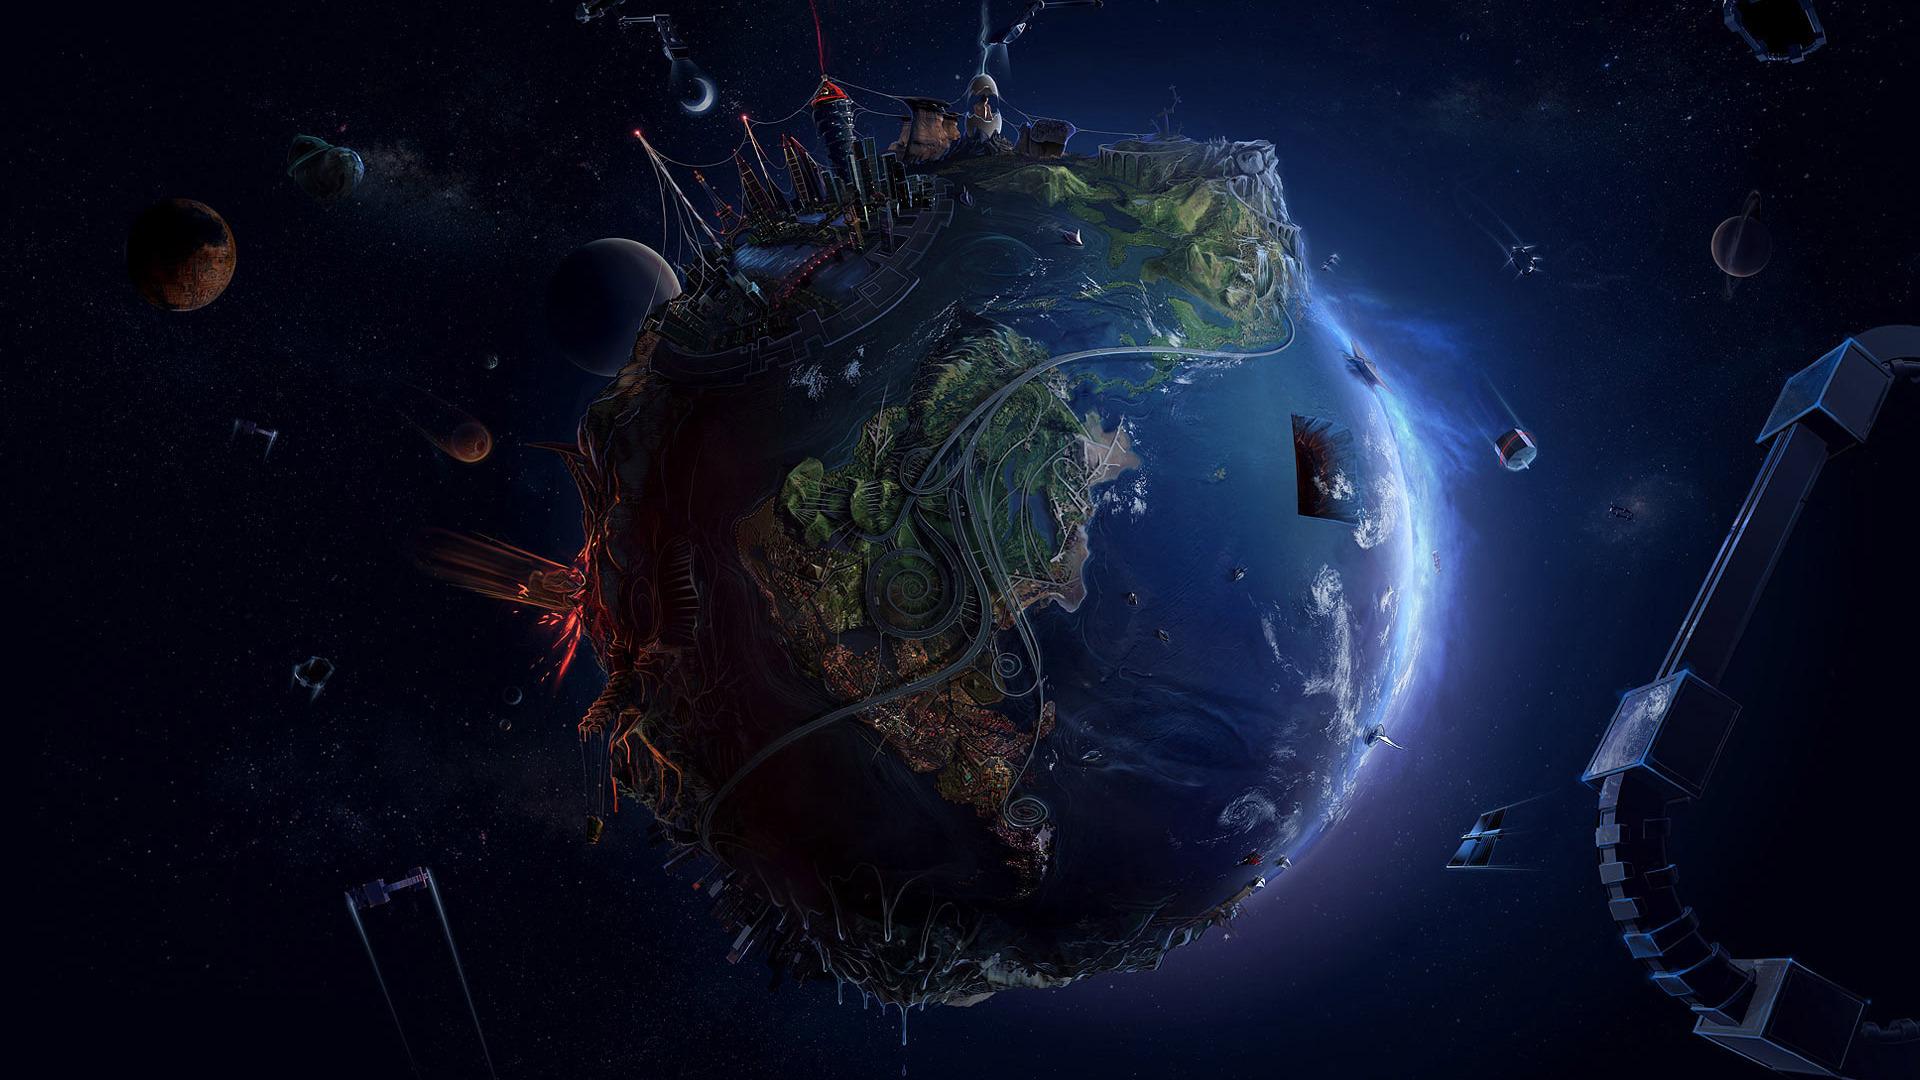 Planet Earth wallpaper 1920x1080